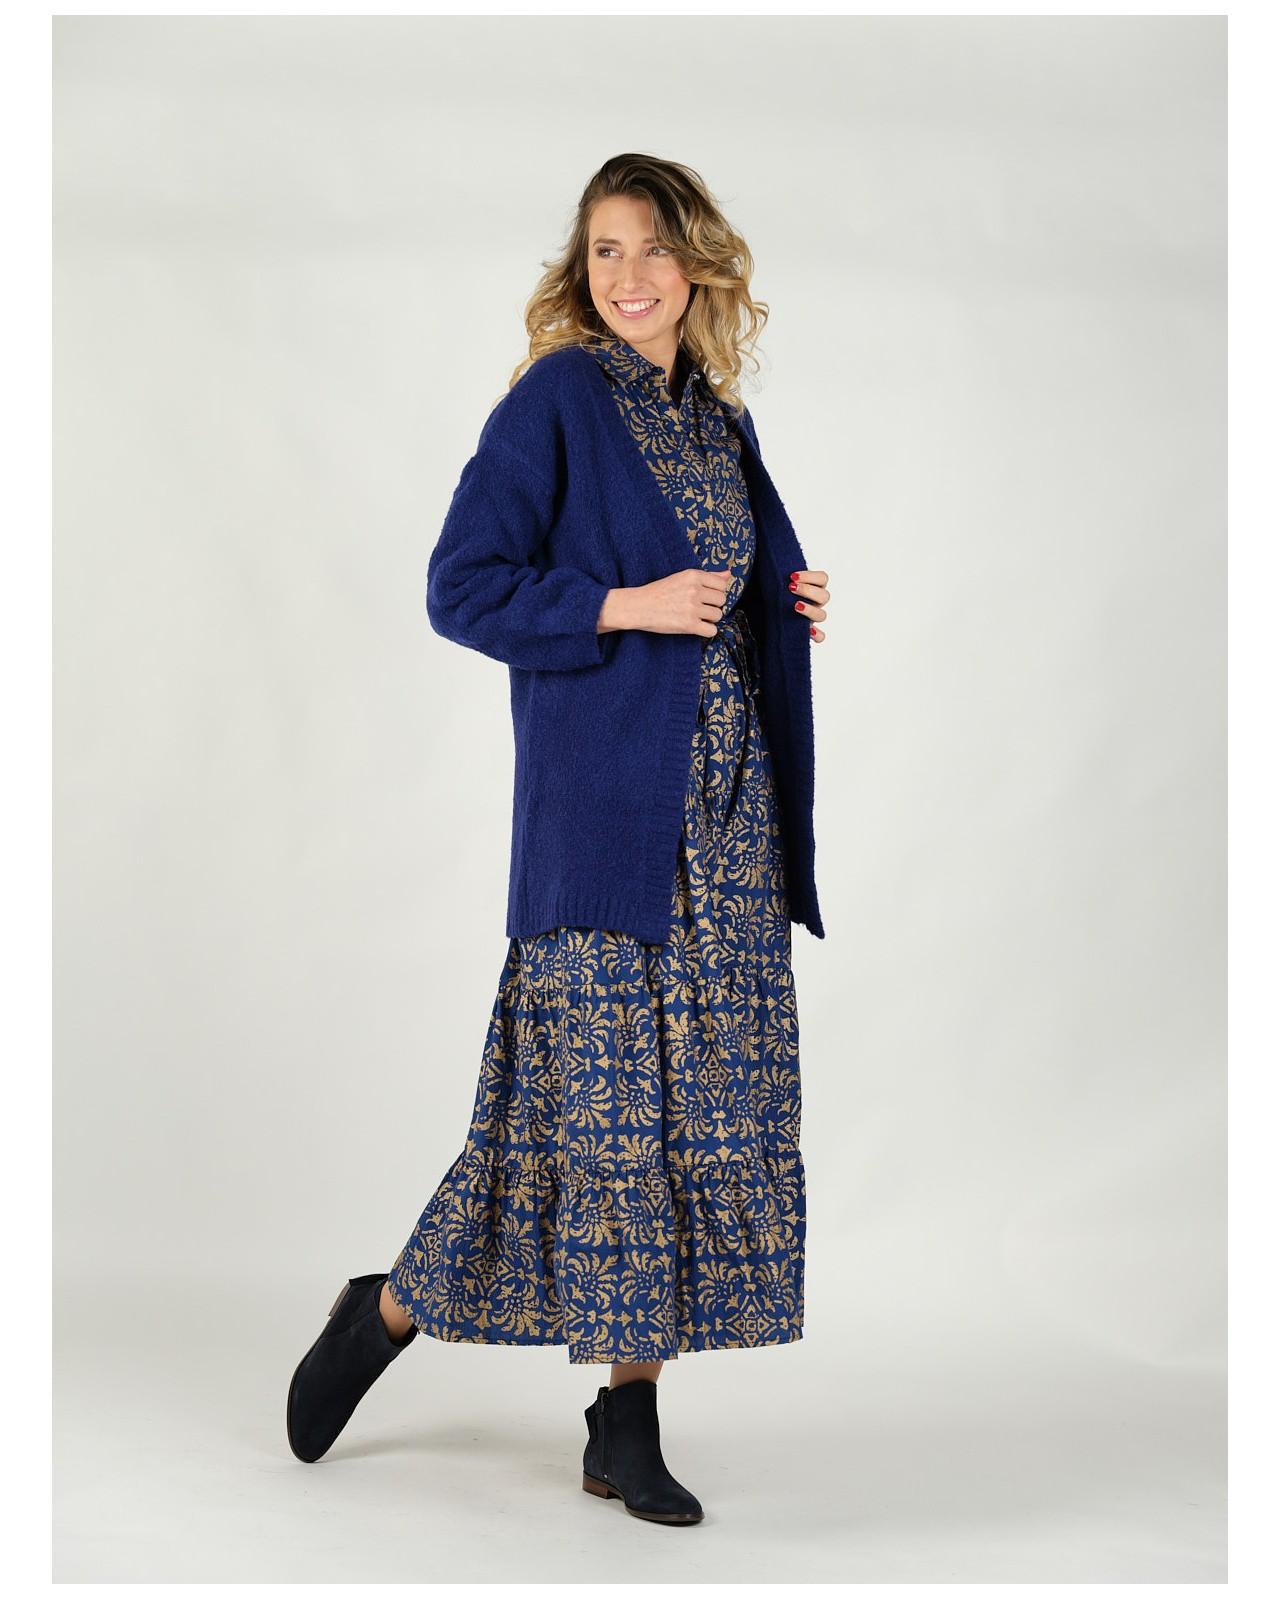 Robe longue romantique Rhum Raisin, Lapis Lazuli 103